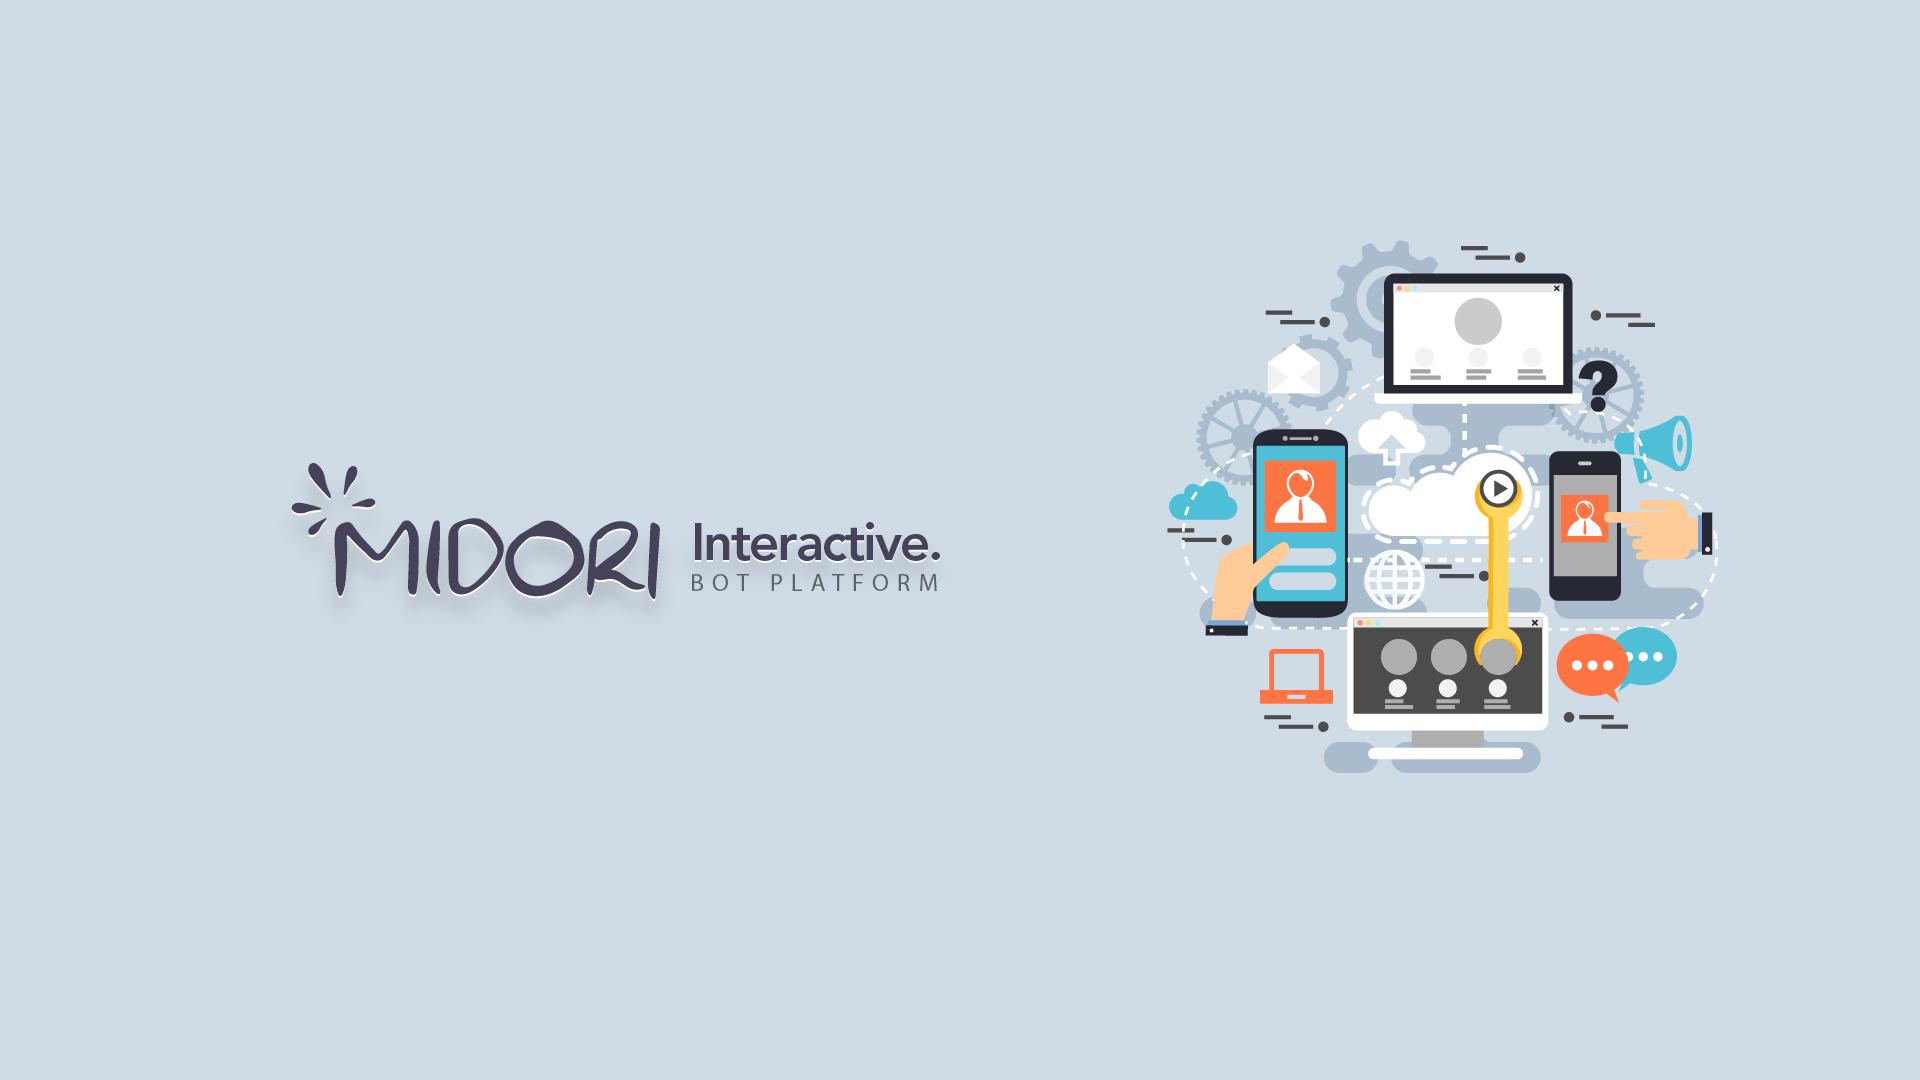 Midori Interactive Chatbot Platform as a Service